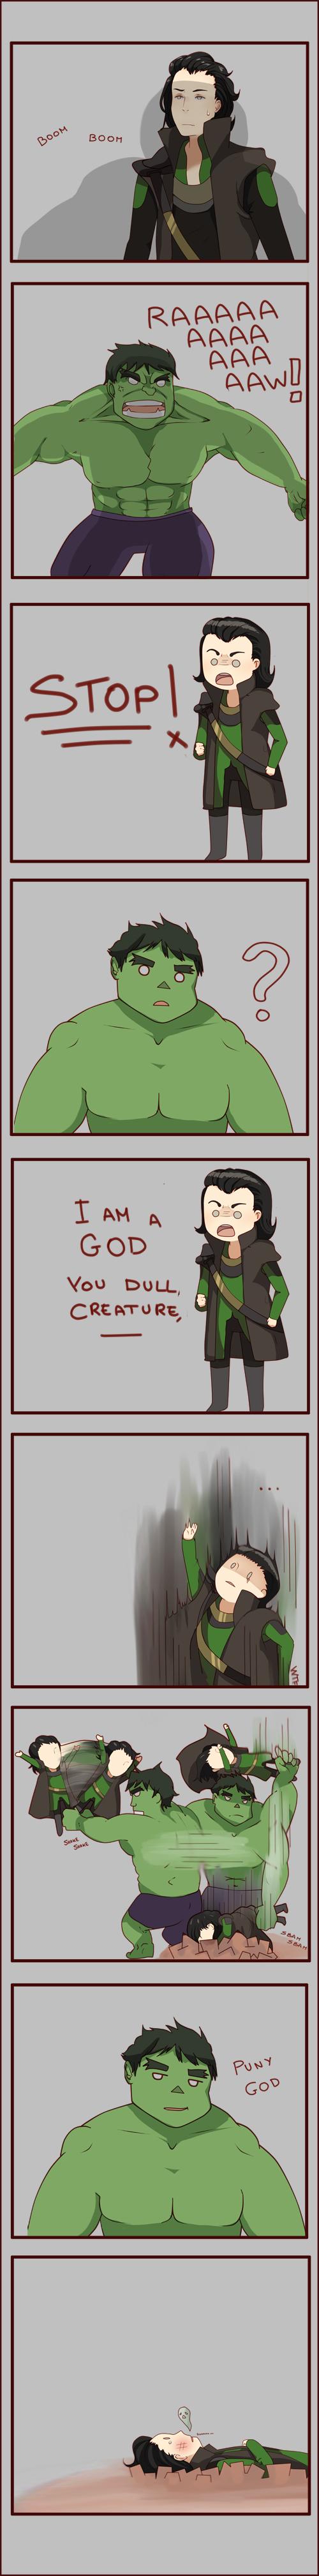 Loki vs Hulk SPOILER by ChocoHal